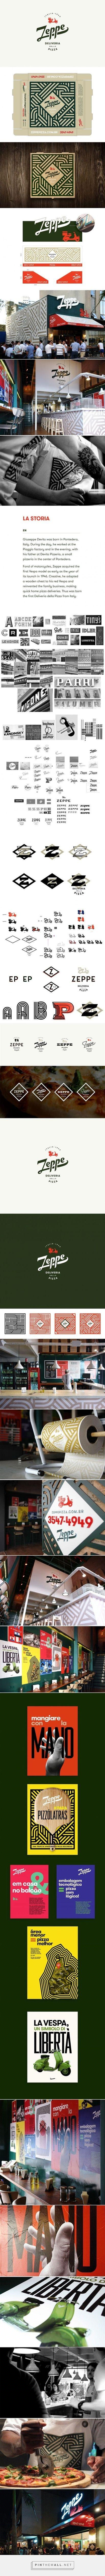 91 best Marketing Branding Design Inspiration images on